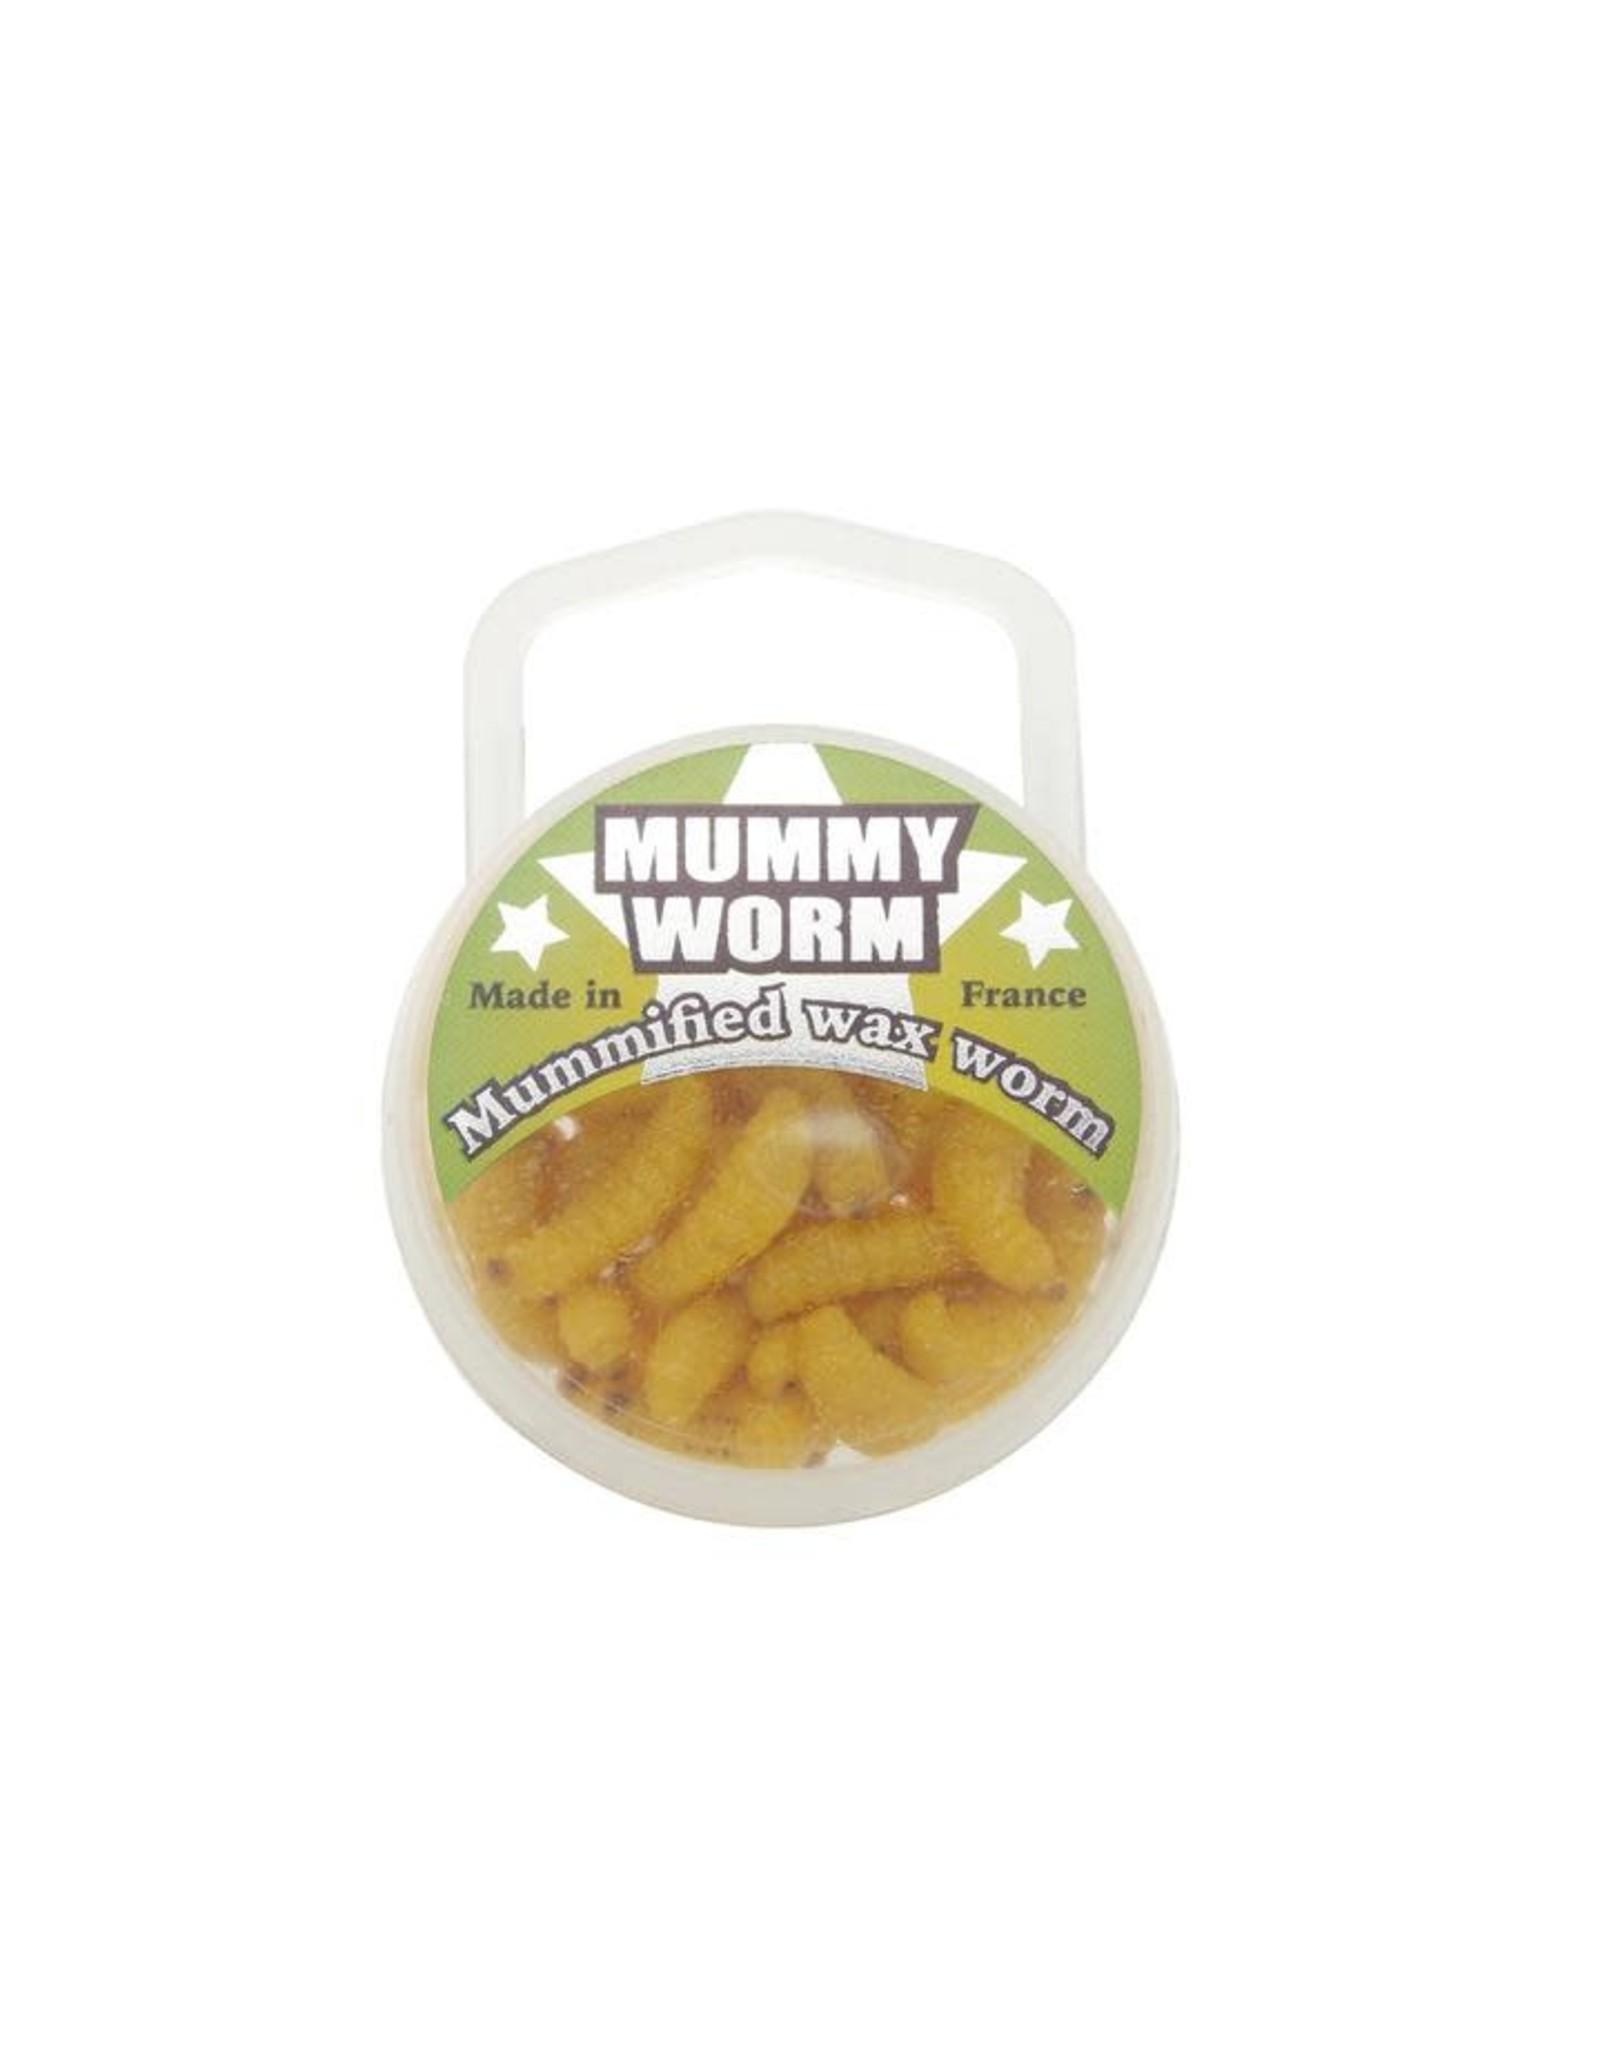 Eurotackle Eurotackle Mummy Worm